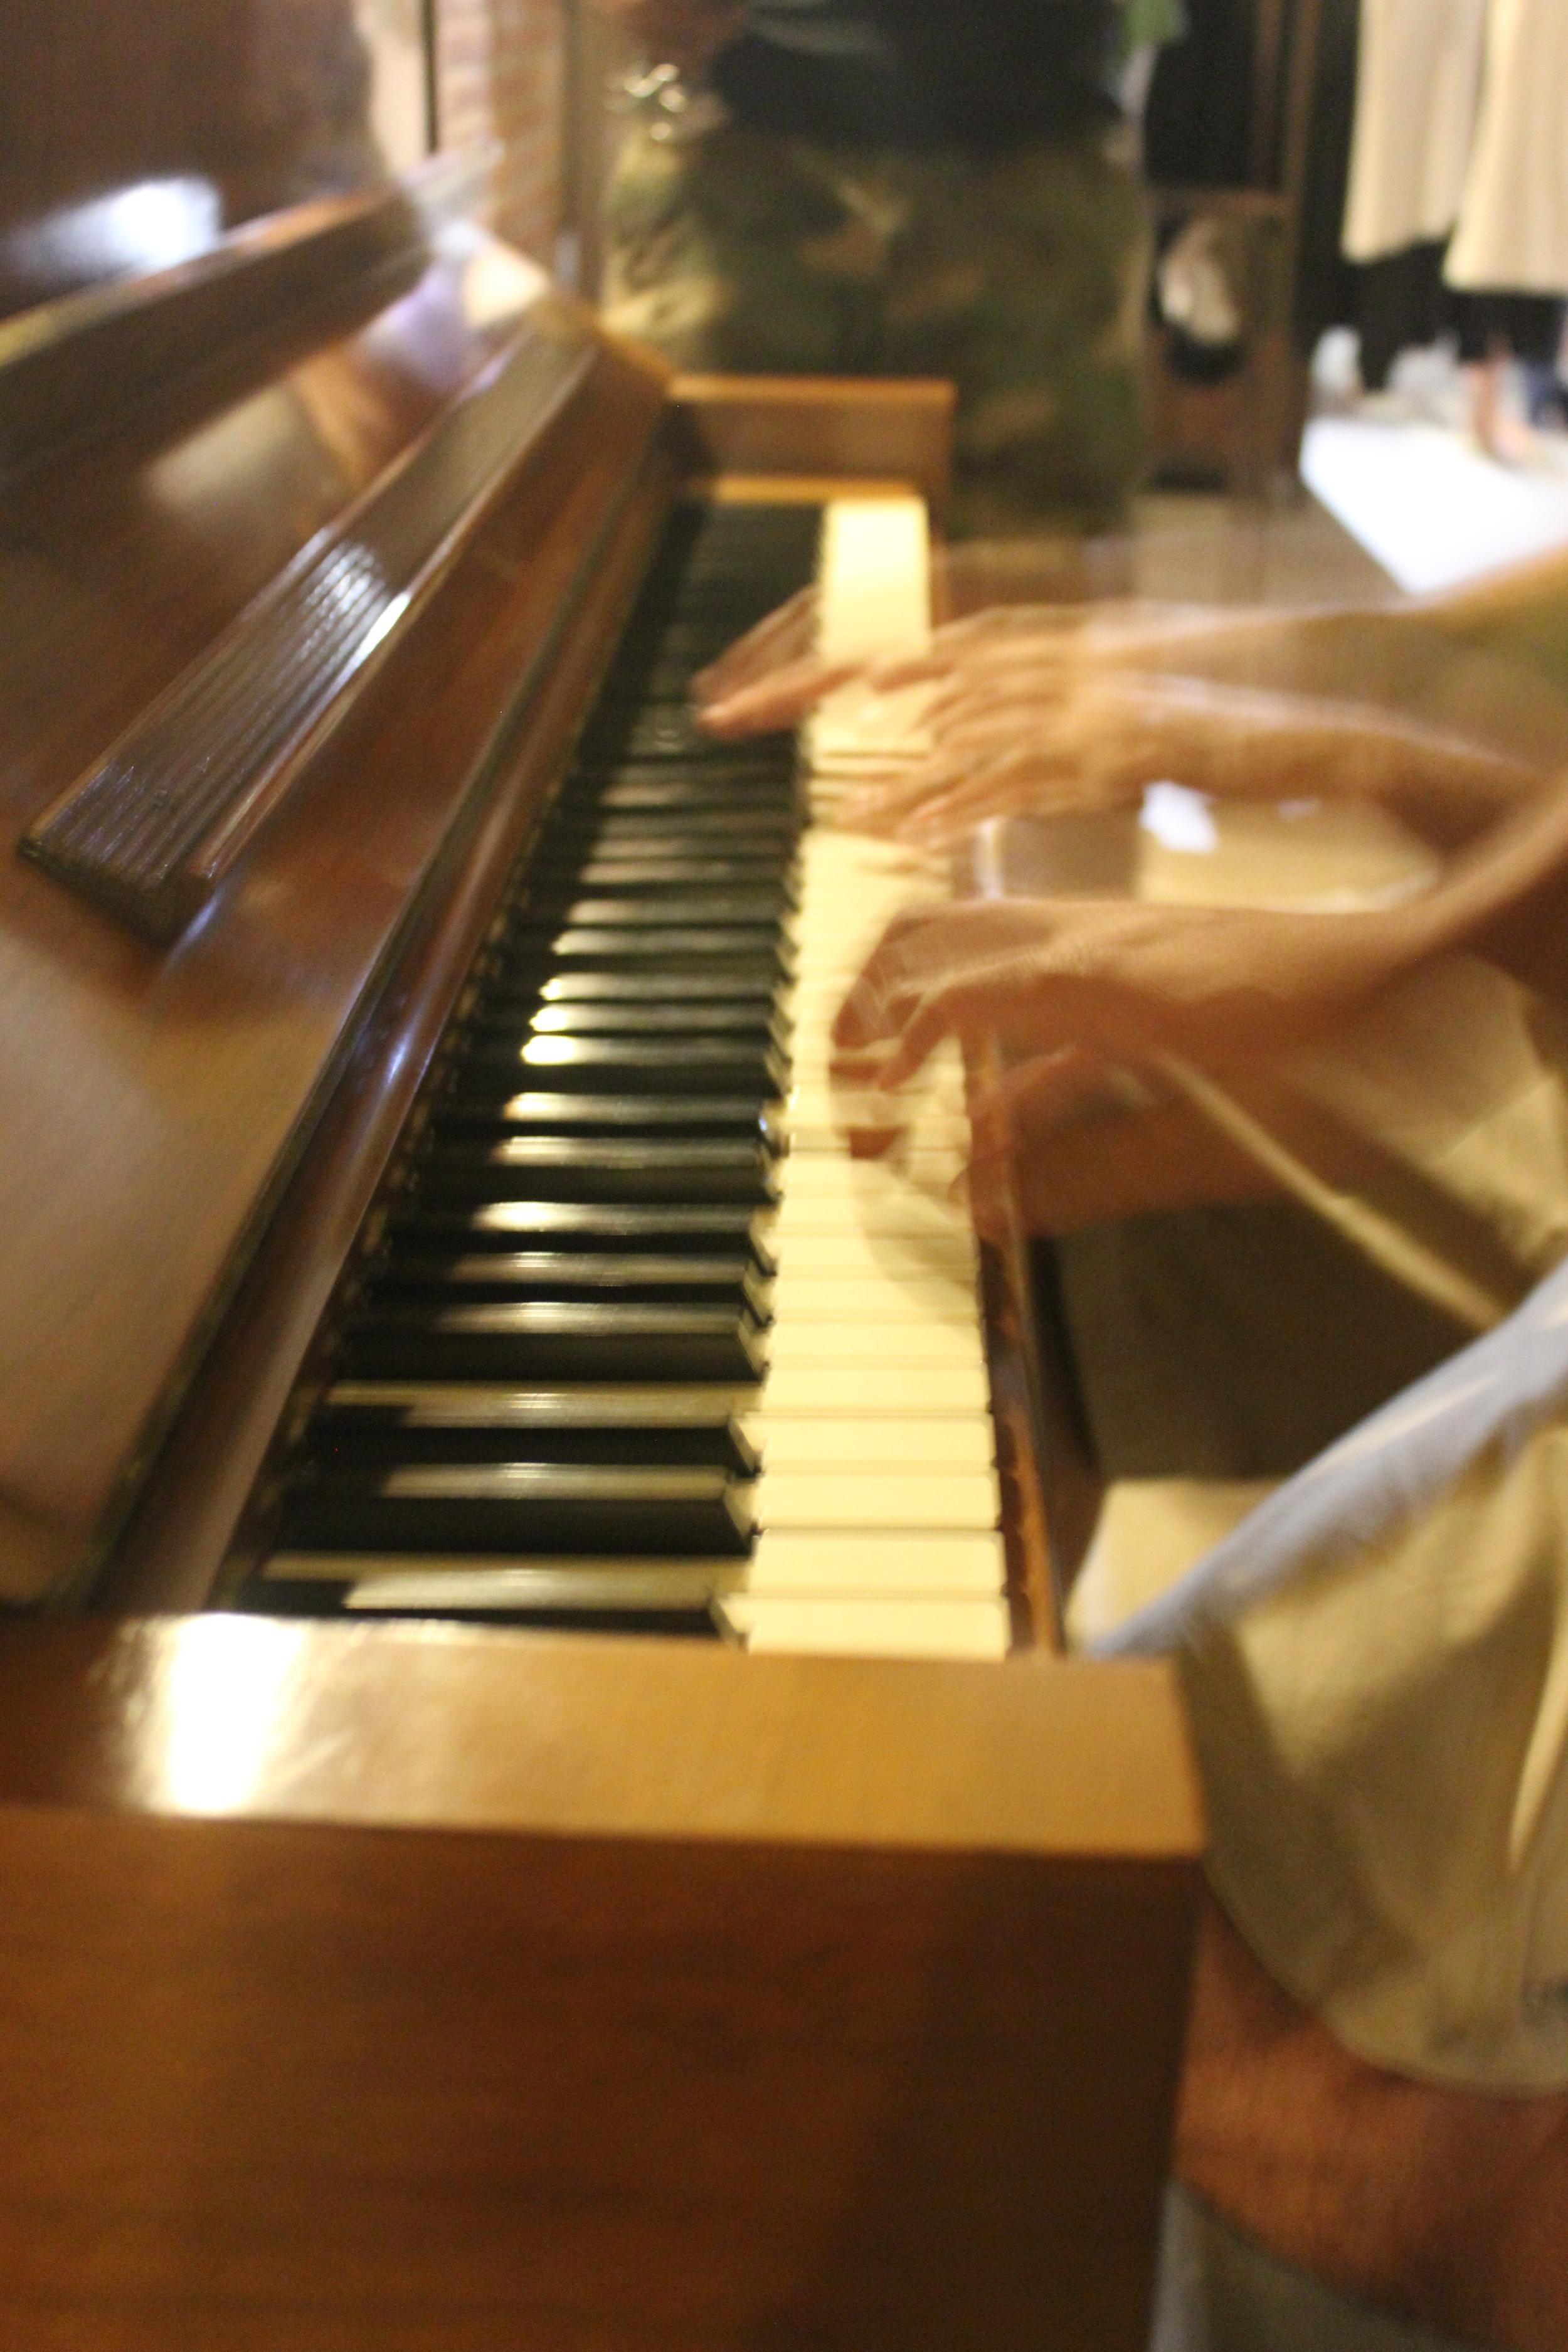 Tasting Room - visitantes tocando piano.jpg